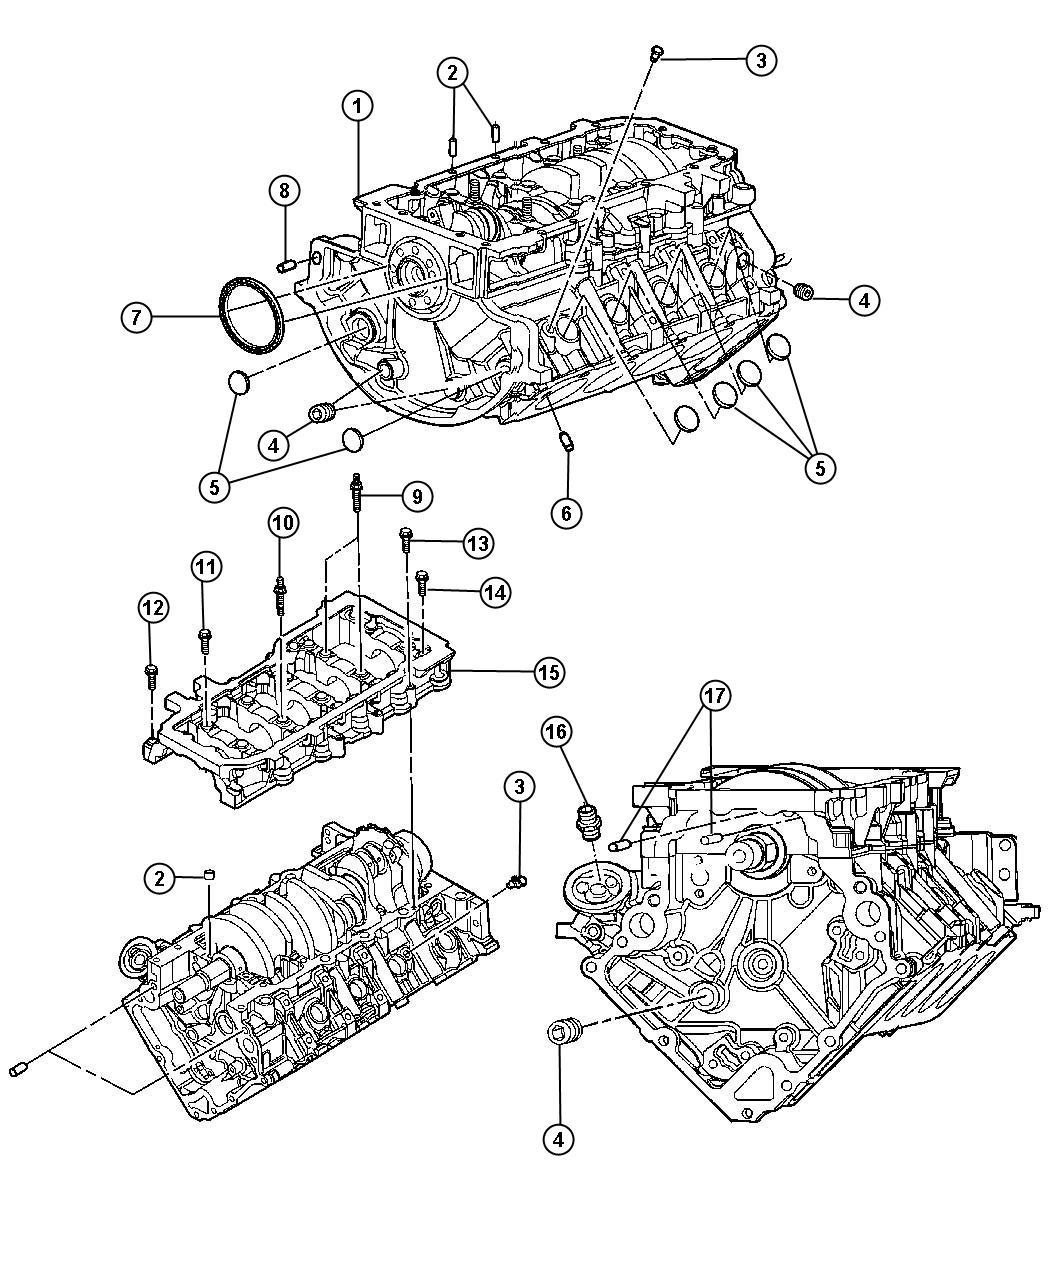 Dodge Dakota Engine Long Block Remanufactured Assembly